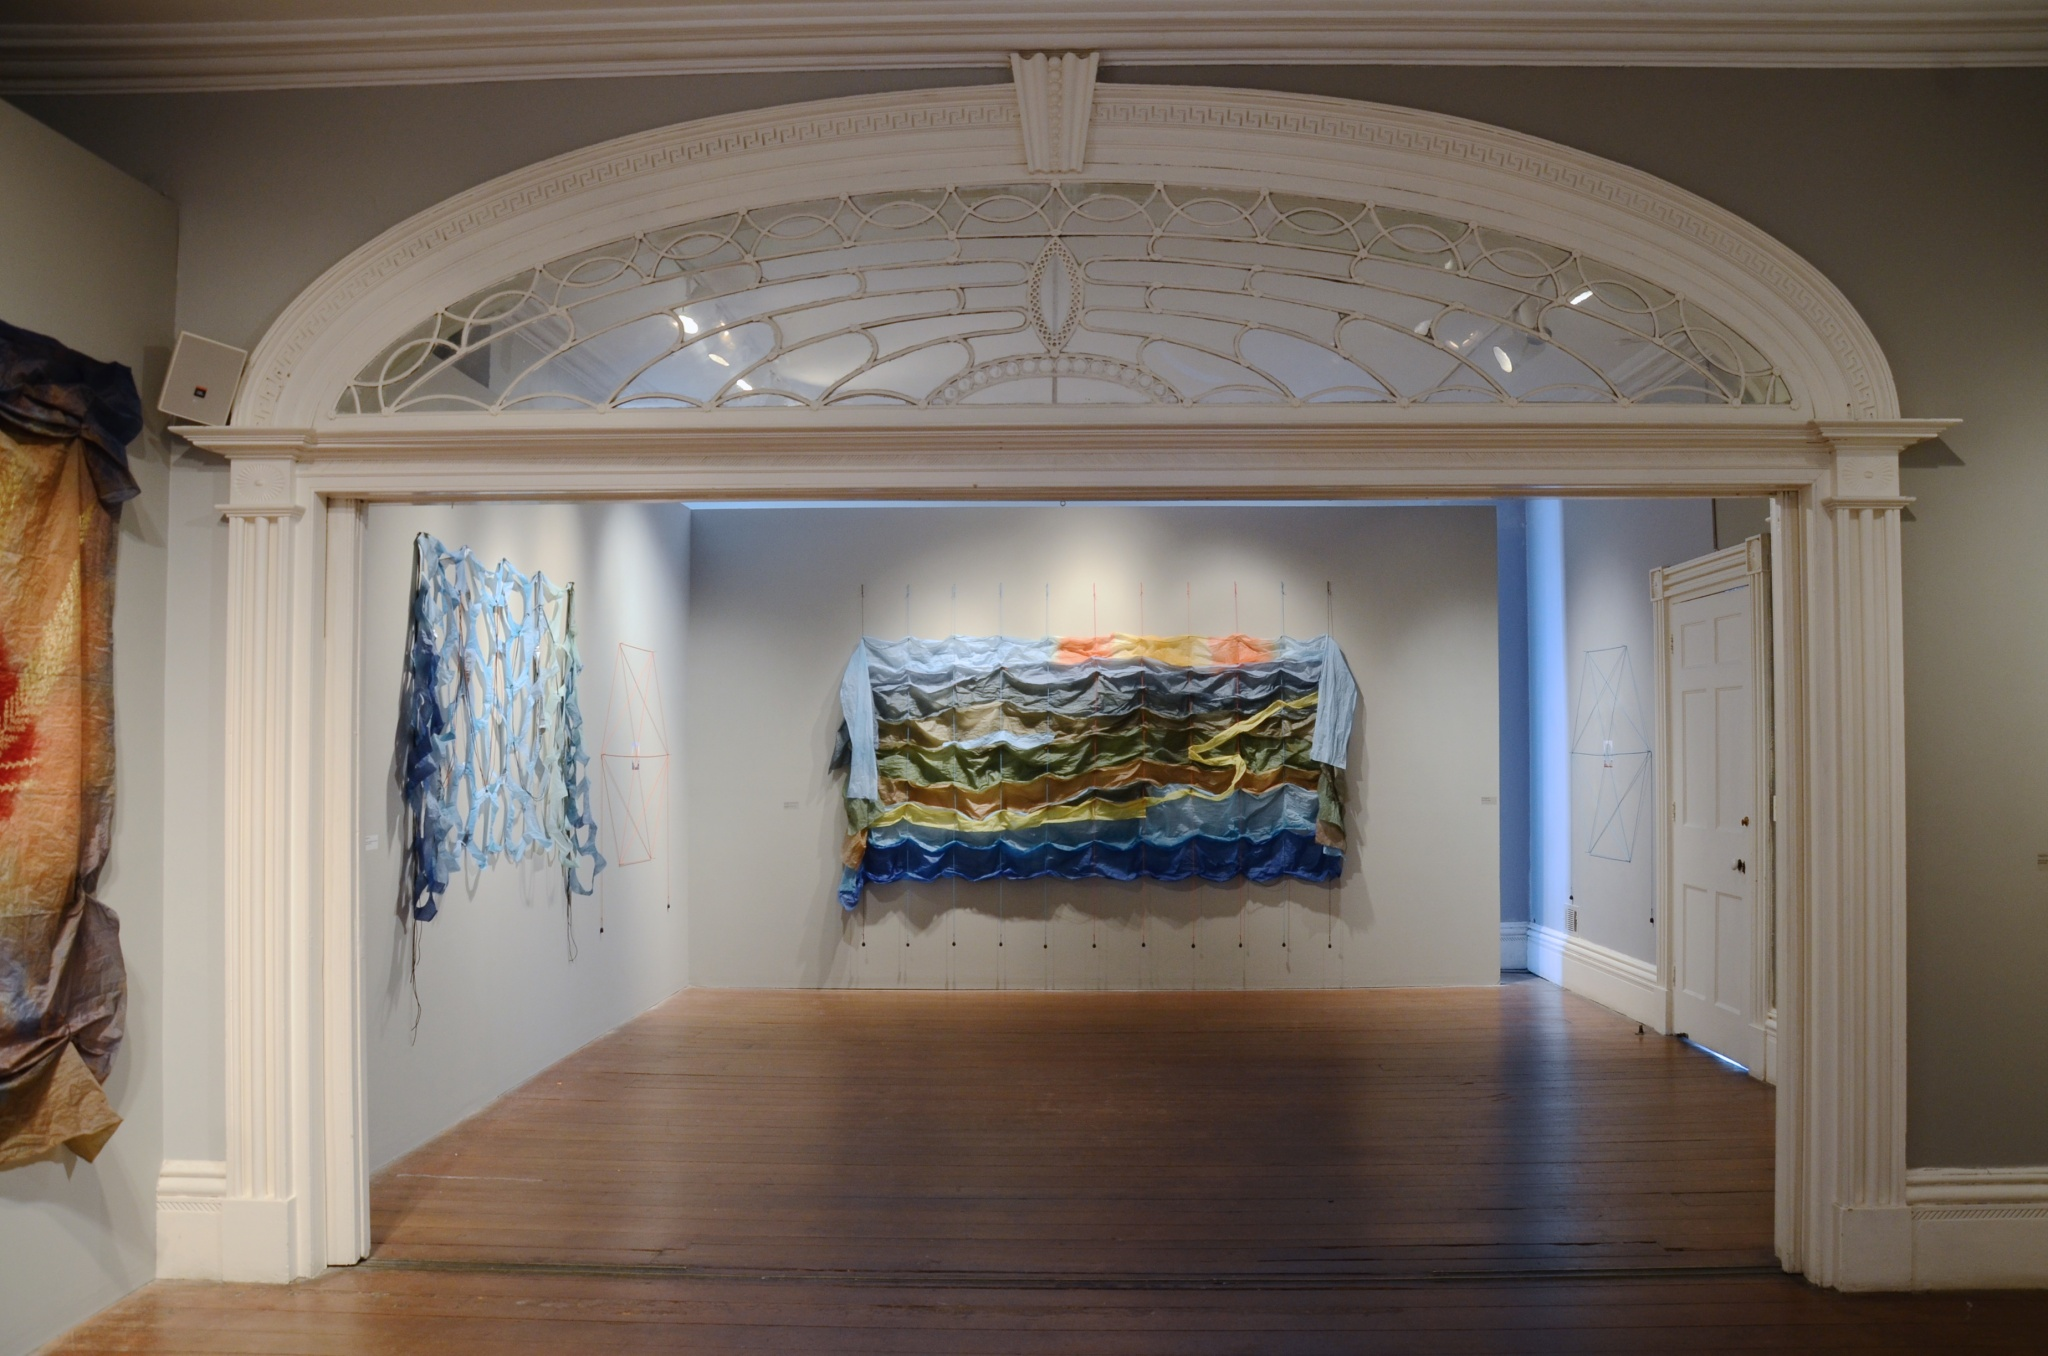 IMMERSIVE REFLECTIONS - Solo exhibition at Gertrude Herbert Institute of Art, April 21 - June 2, 2017